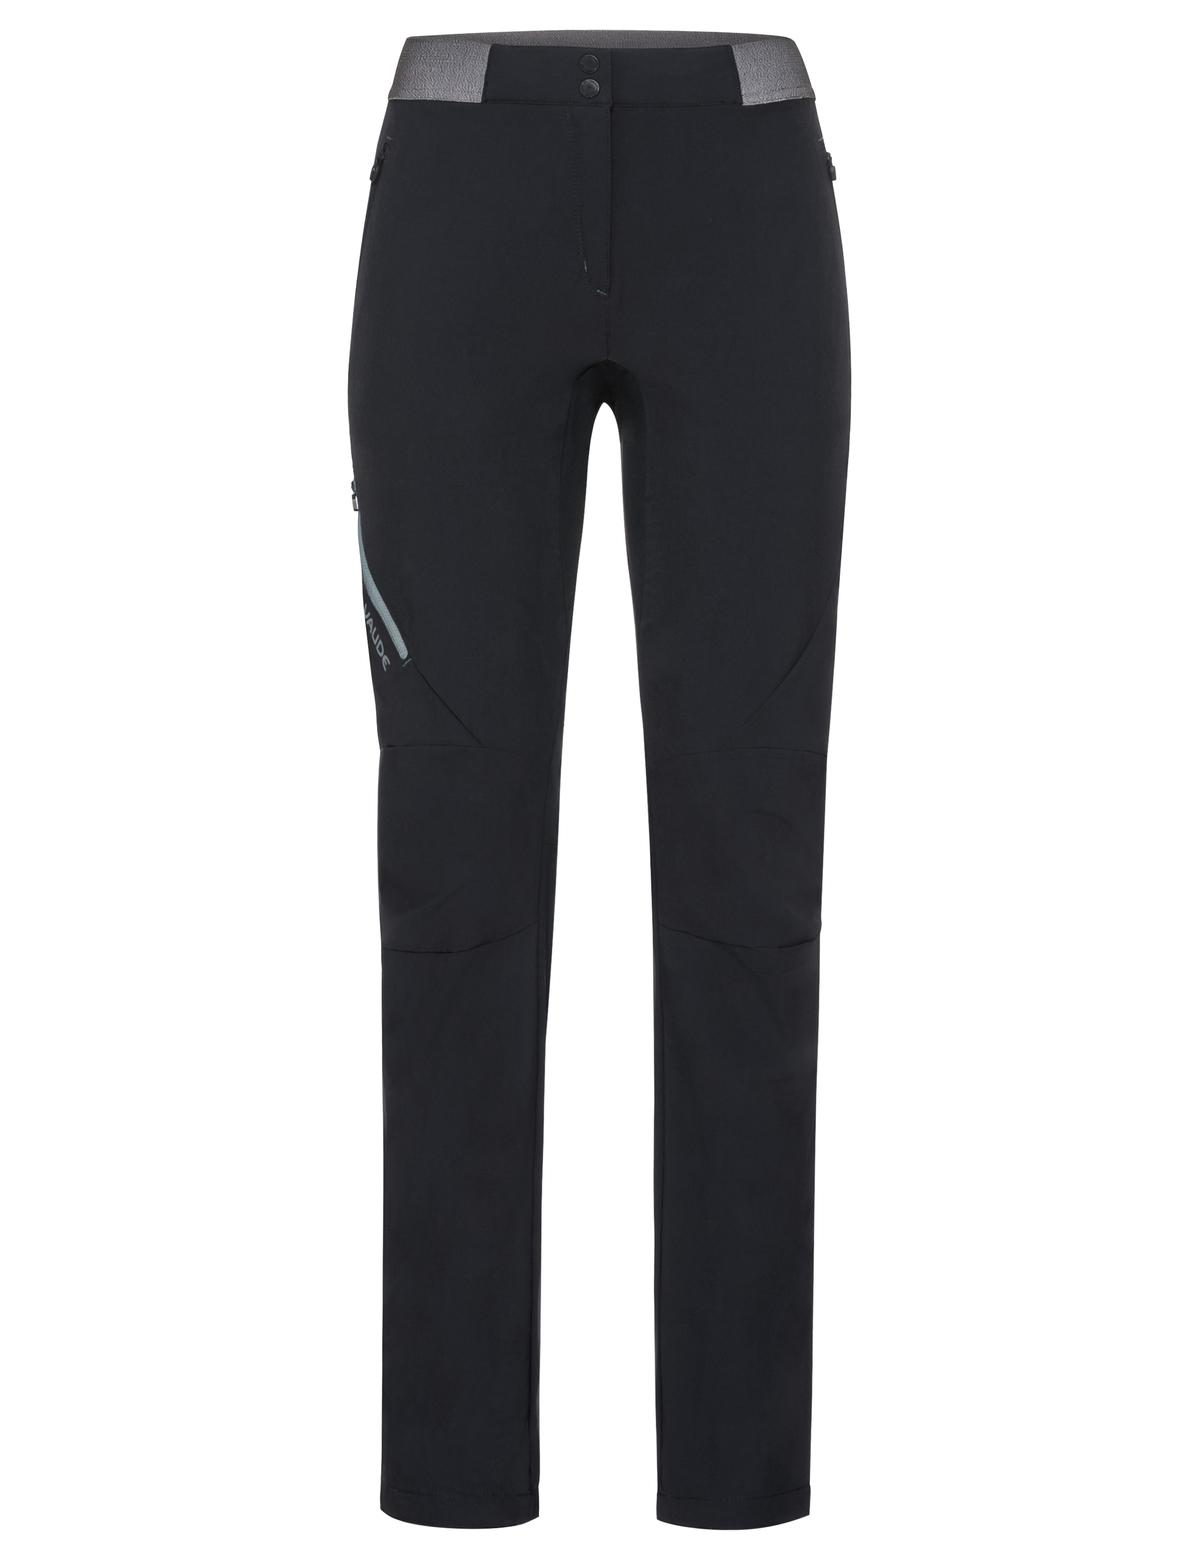 Vaude Scopi Pants II - Pantalon randonnée femme